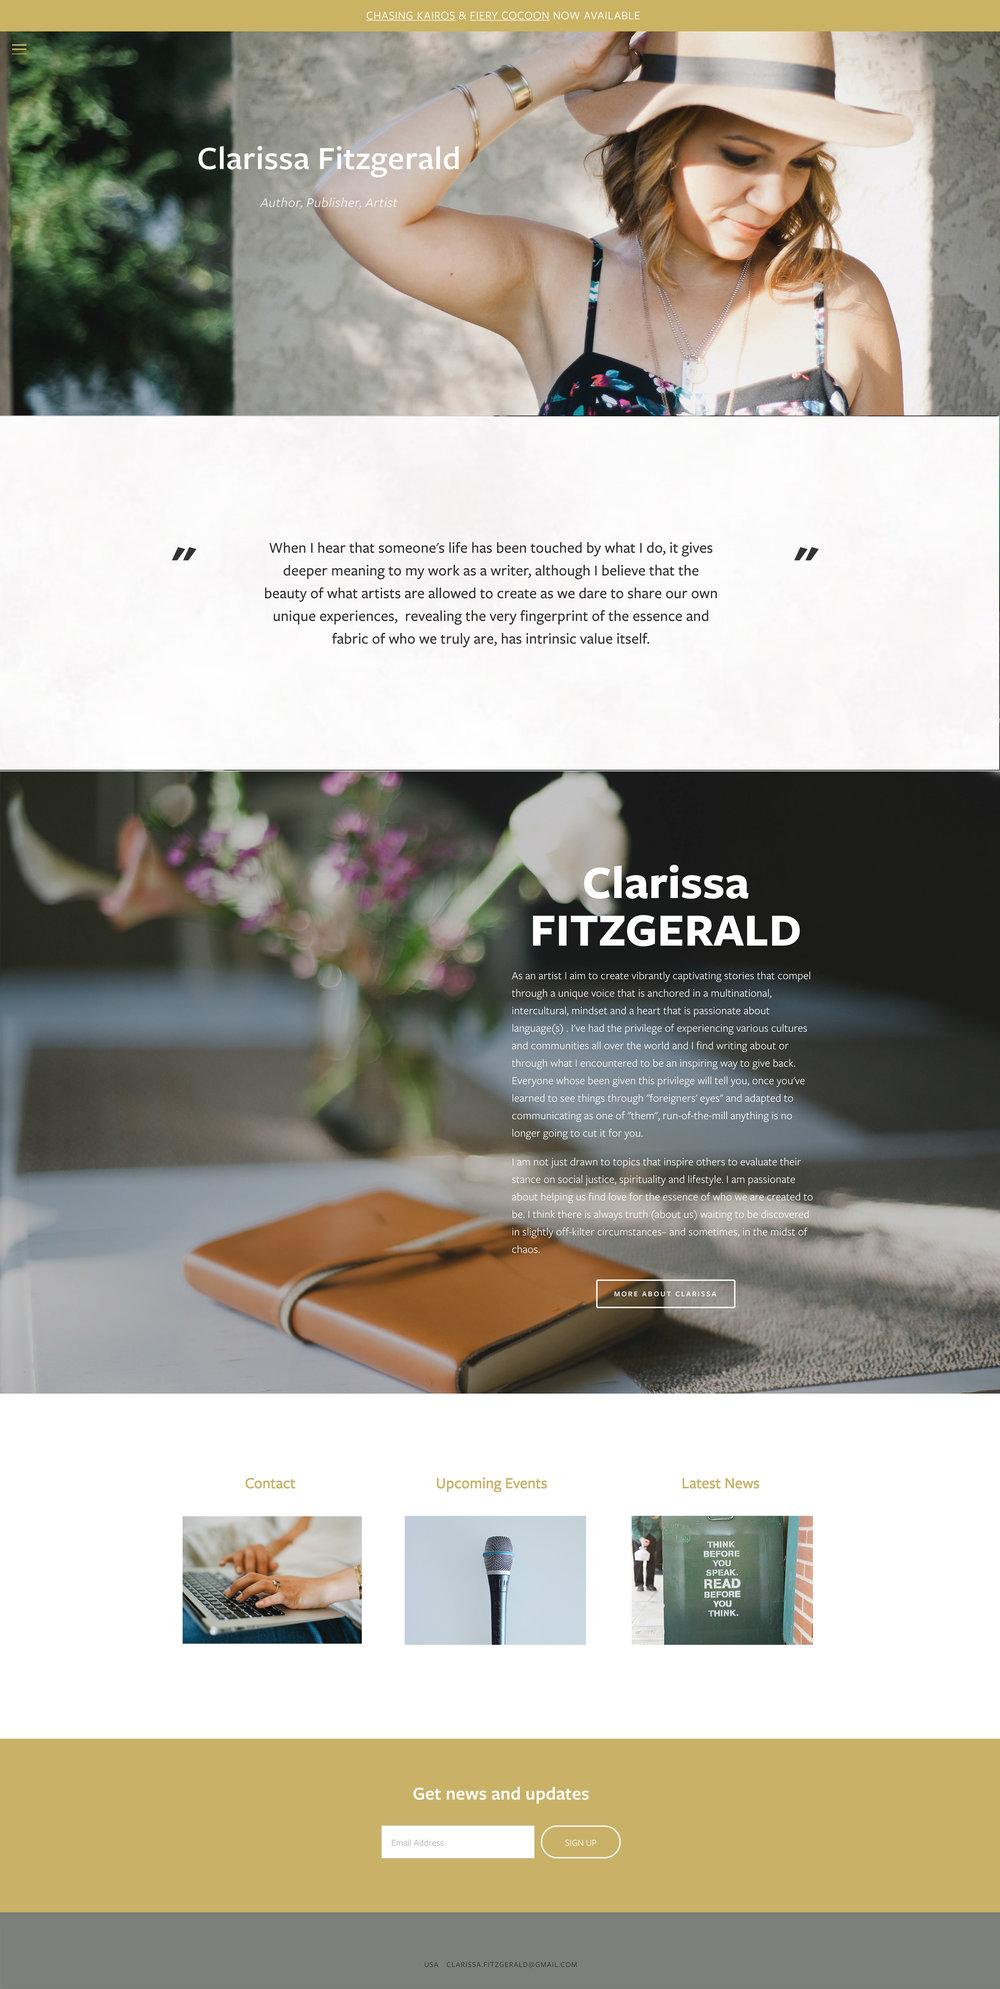 Clarissa Fitzgerald.jpg